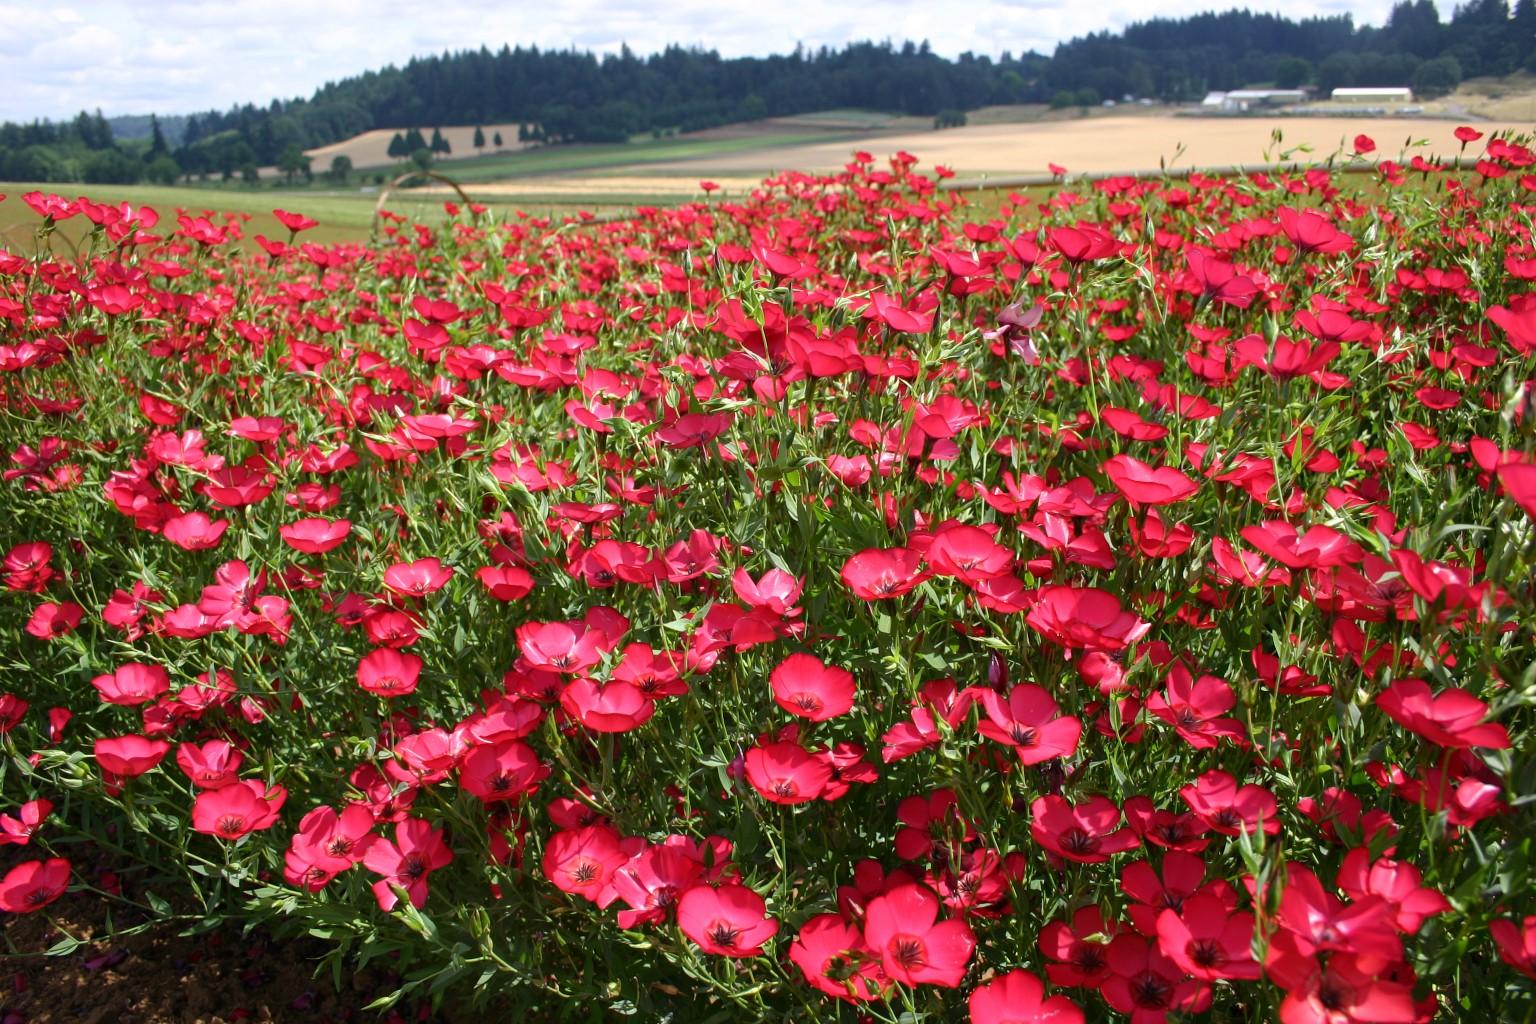 Red Flax Seeds Scarlet Flax Linum grandiflorum